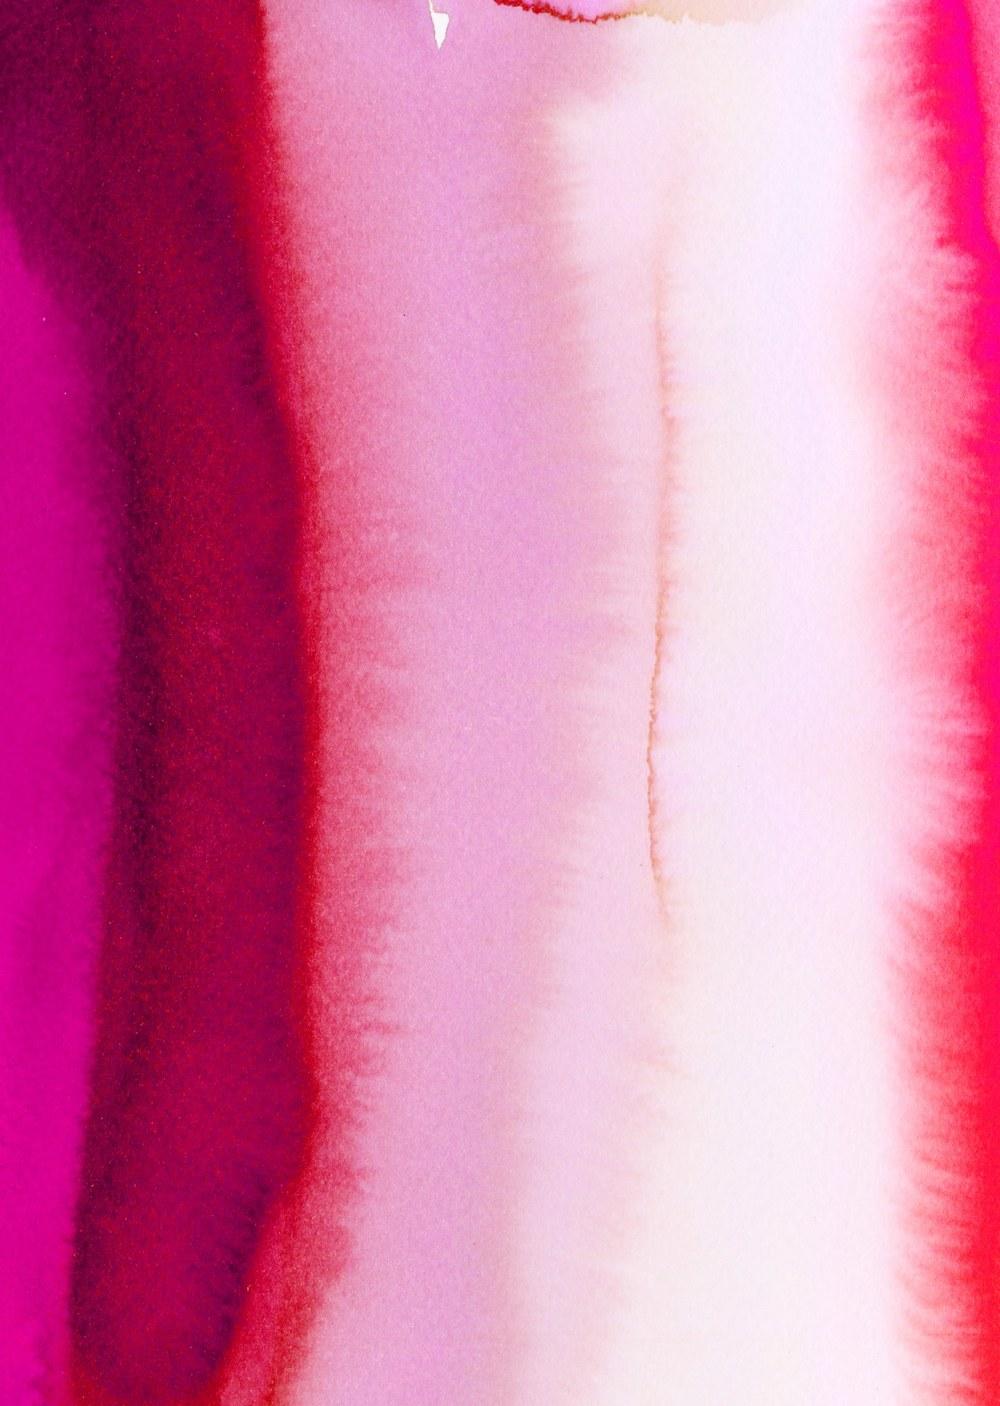 WATERCOLOR_pink.jpeg